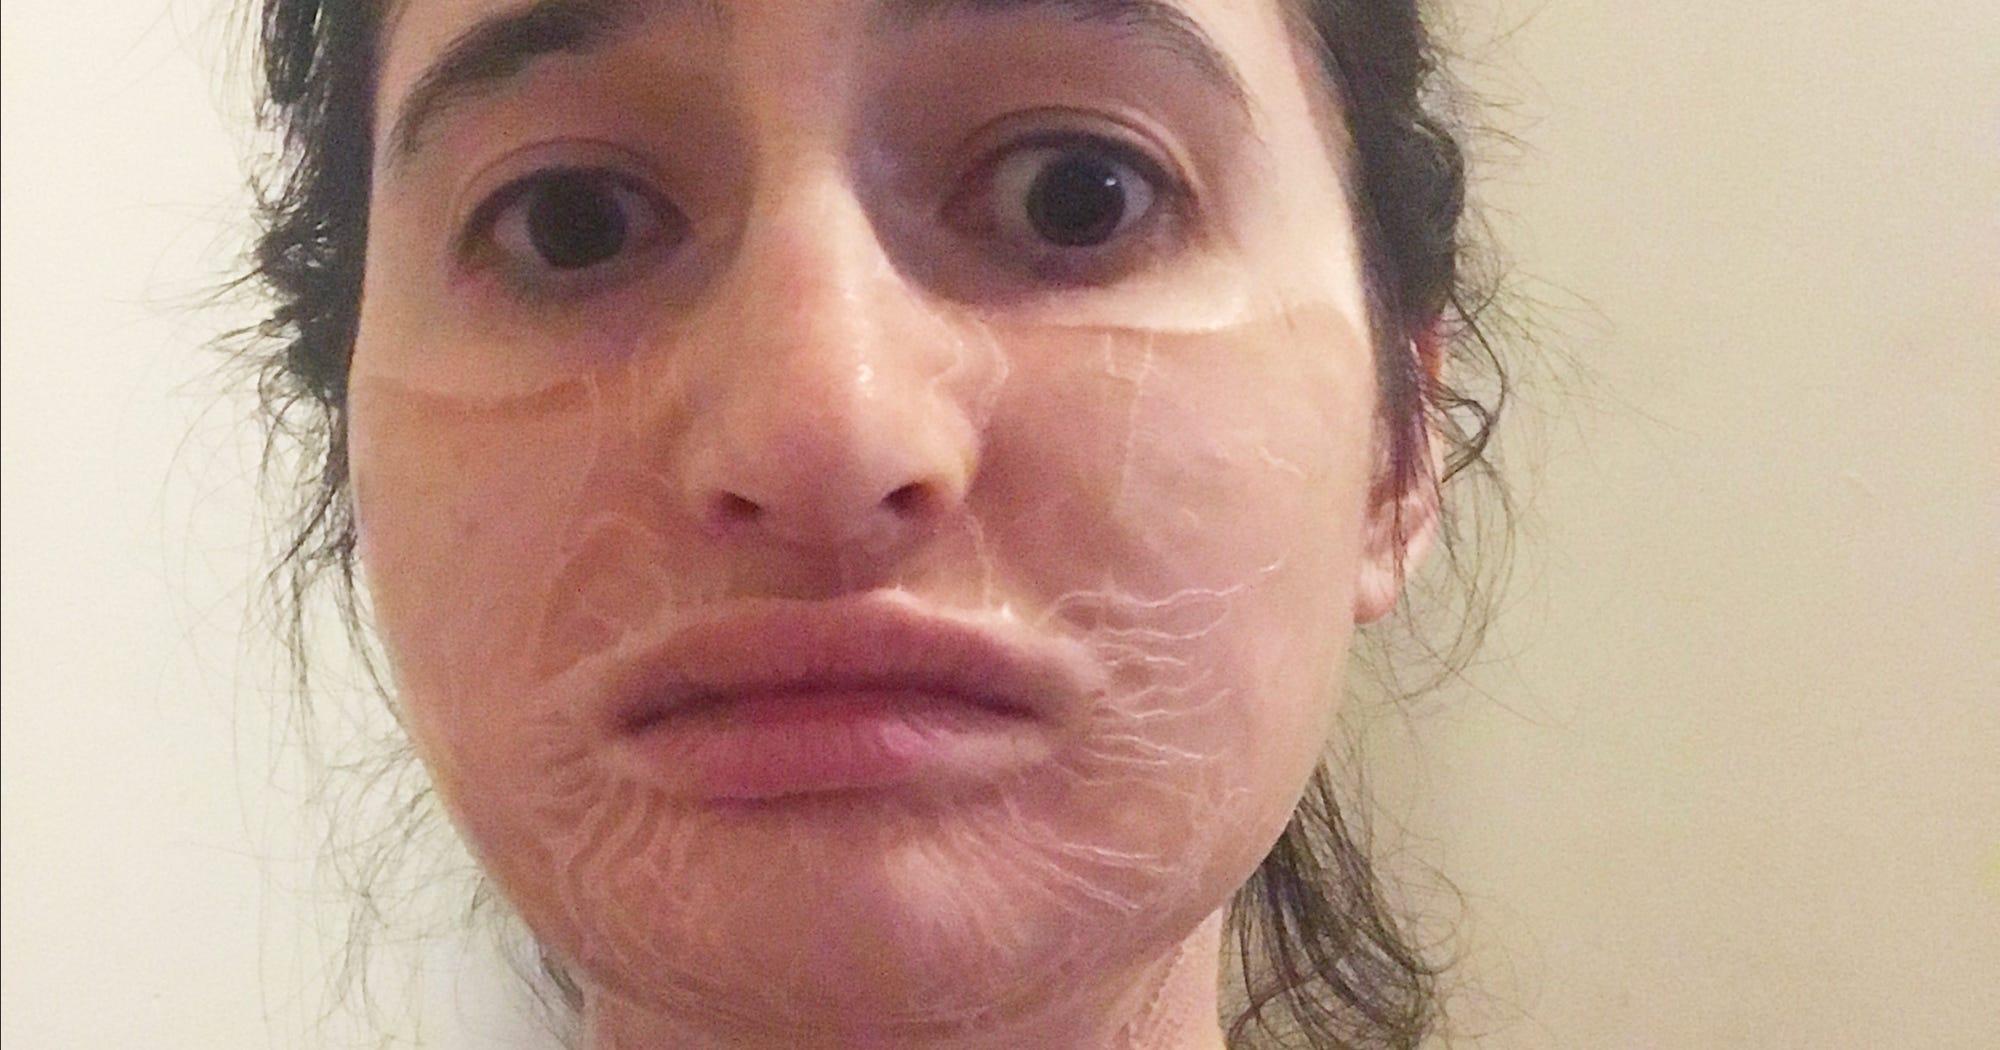 Hanacure Face Mask Skin Tightening Effect Photos